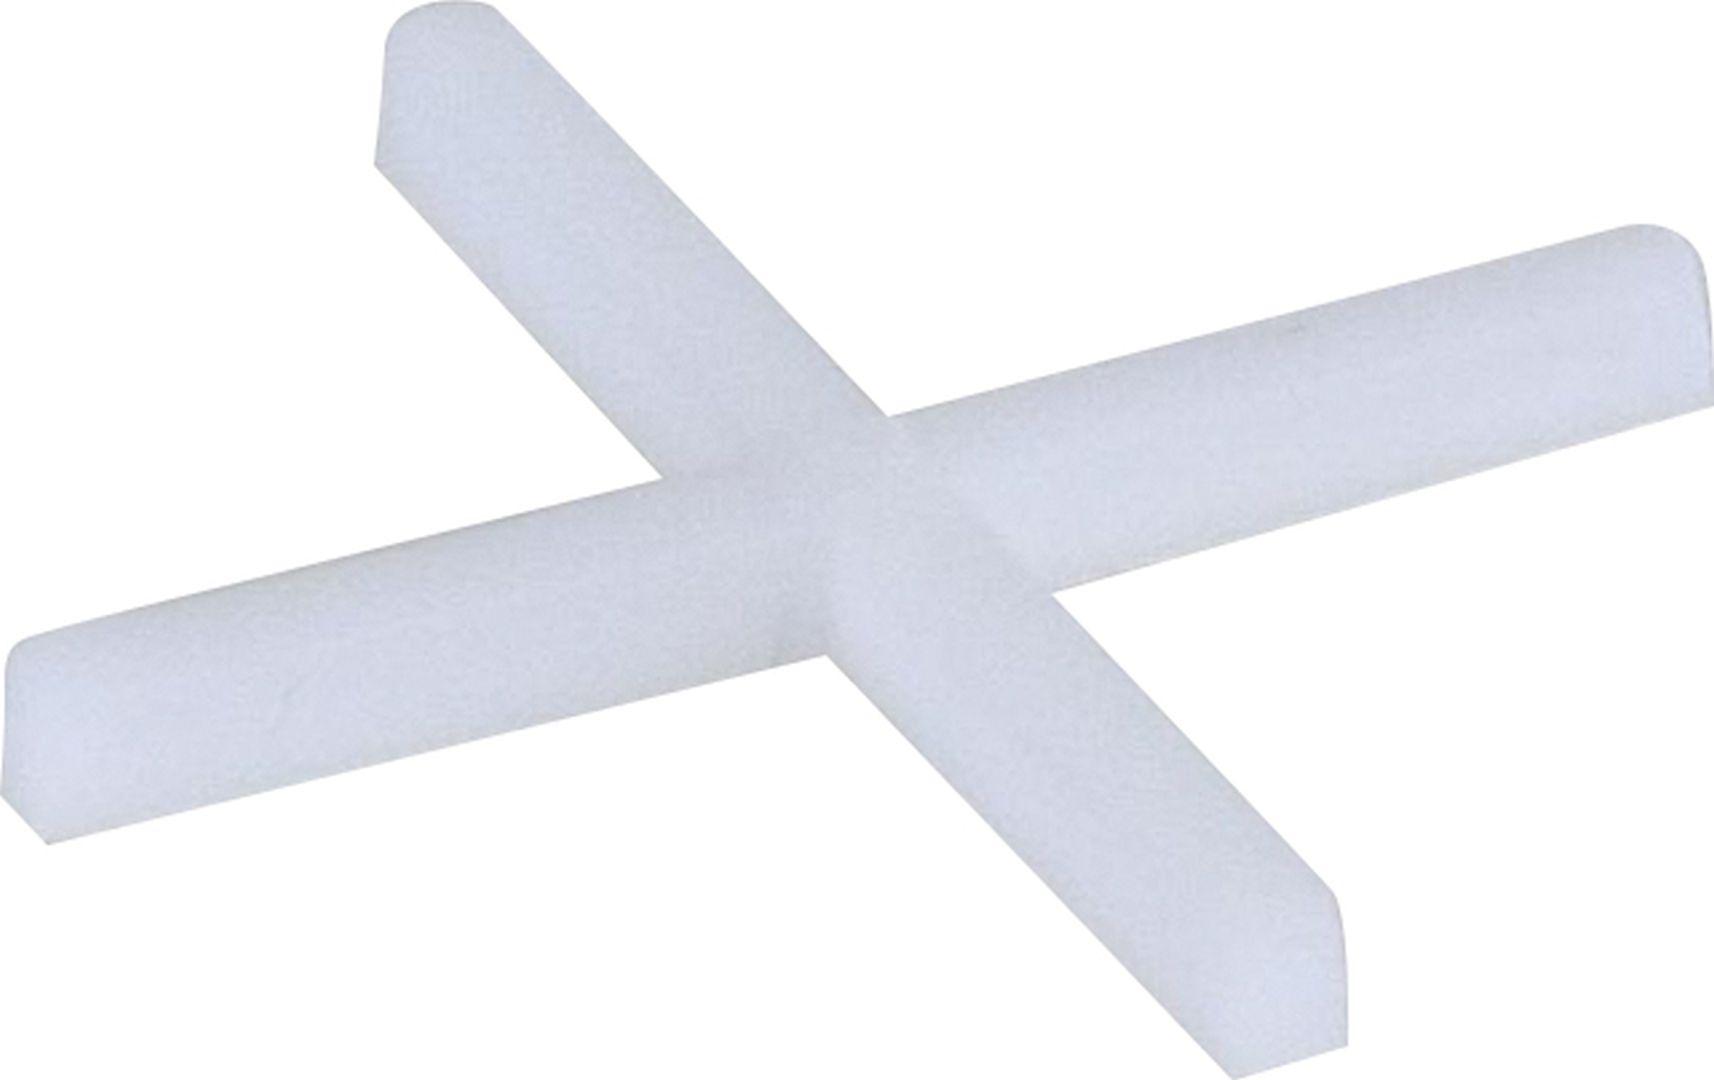 TRIUSO Fliesenkreuze aus Kunststoff, weiß, 500 Stück, 2,5 mm